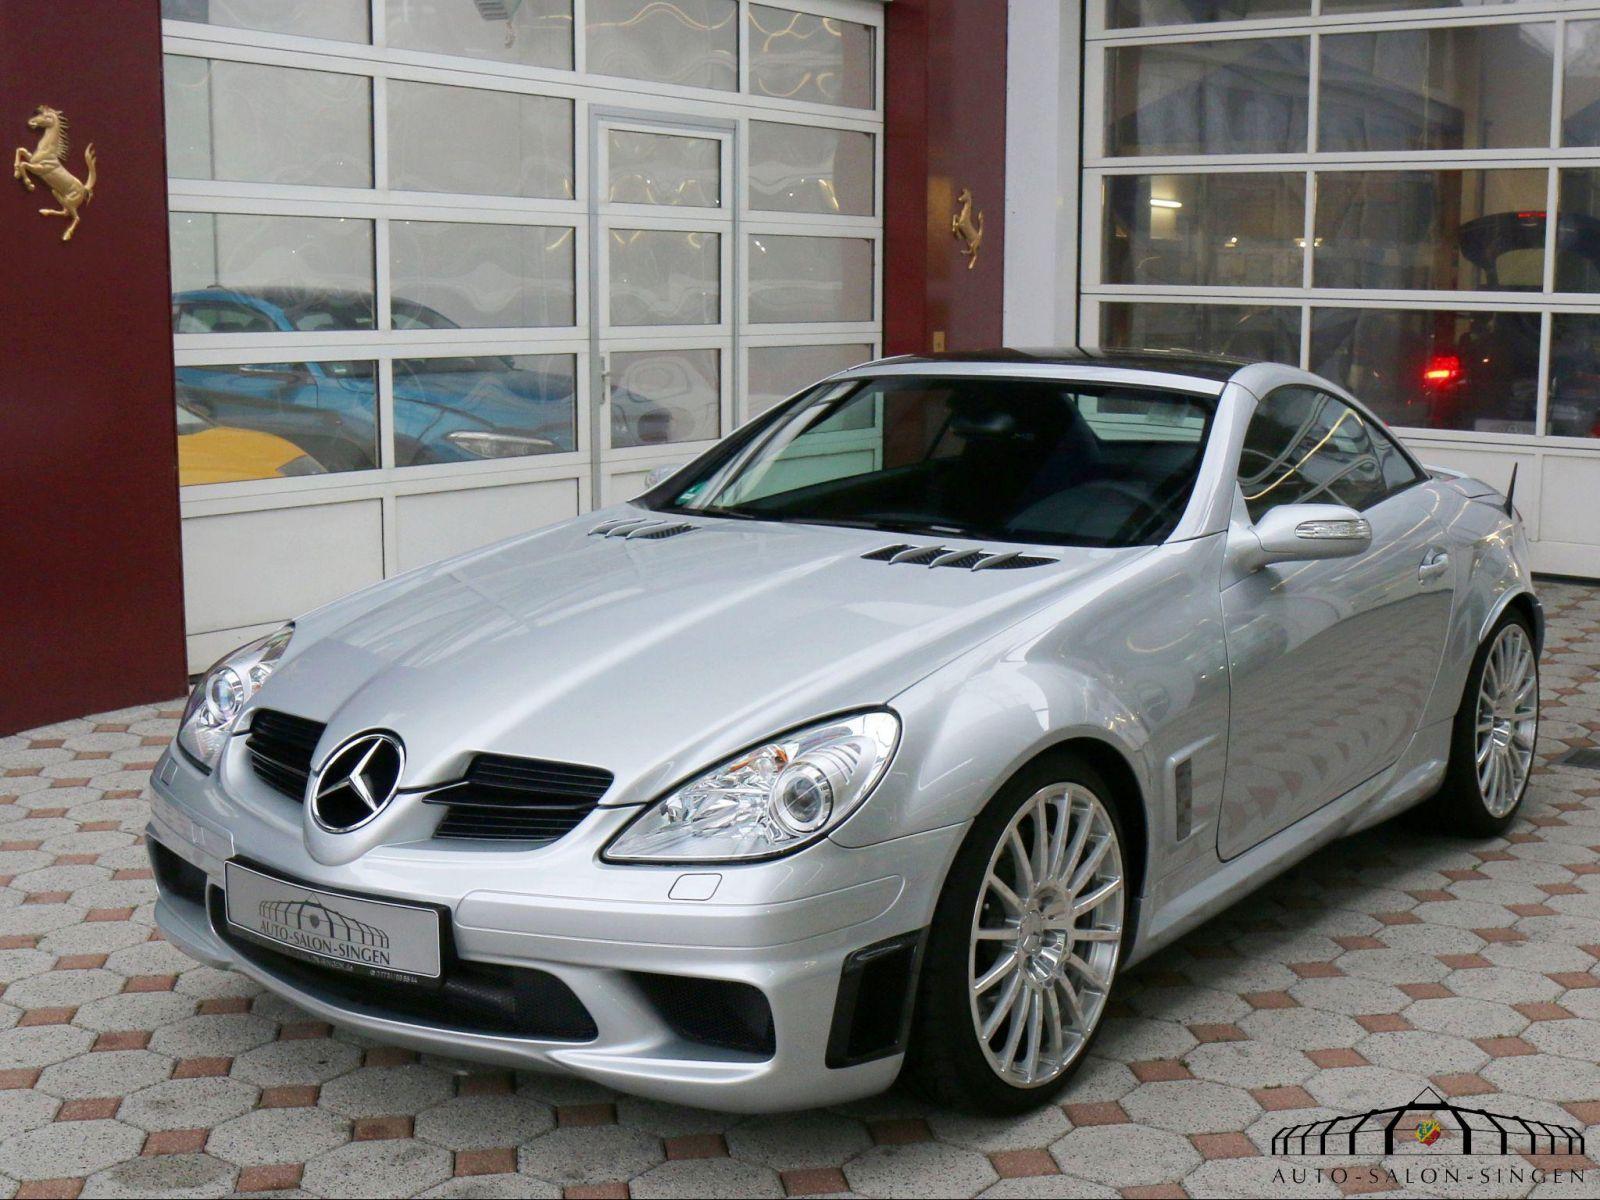 Mercedes Benz Slk 55 Amg Black Series Coupe Auto Salon Singen